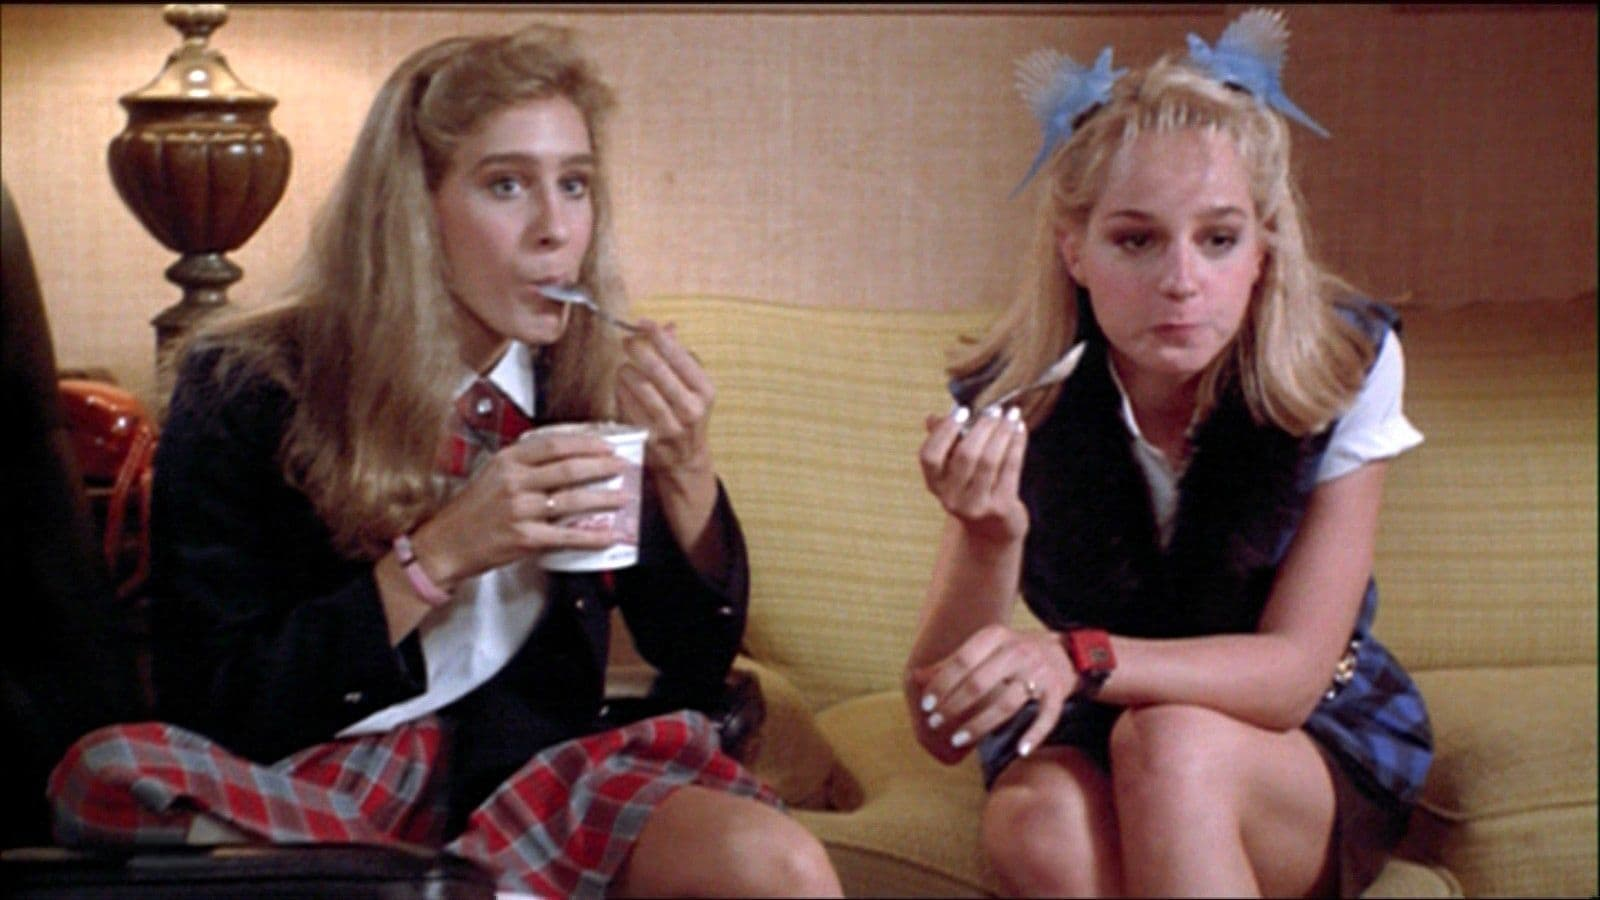 School Girls (1985)